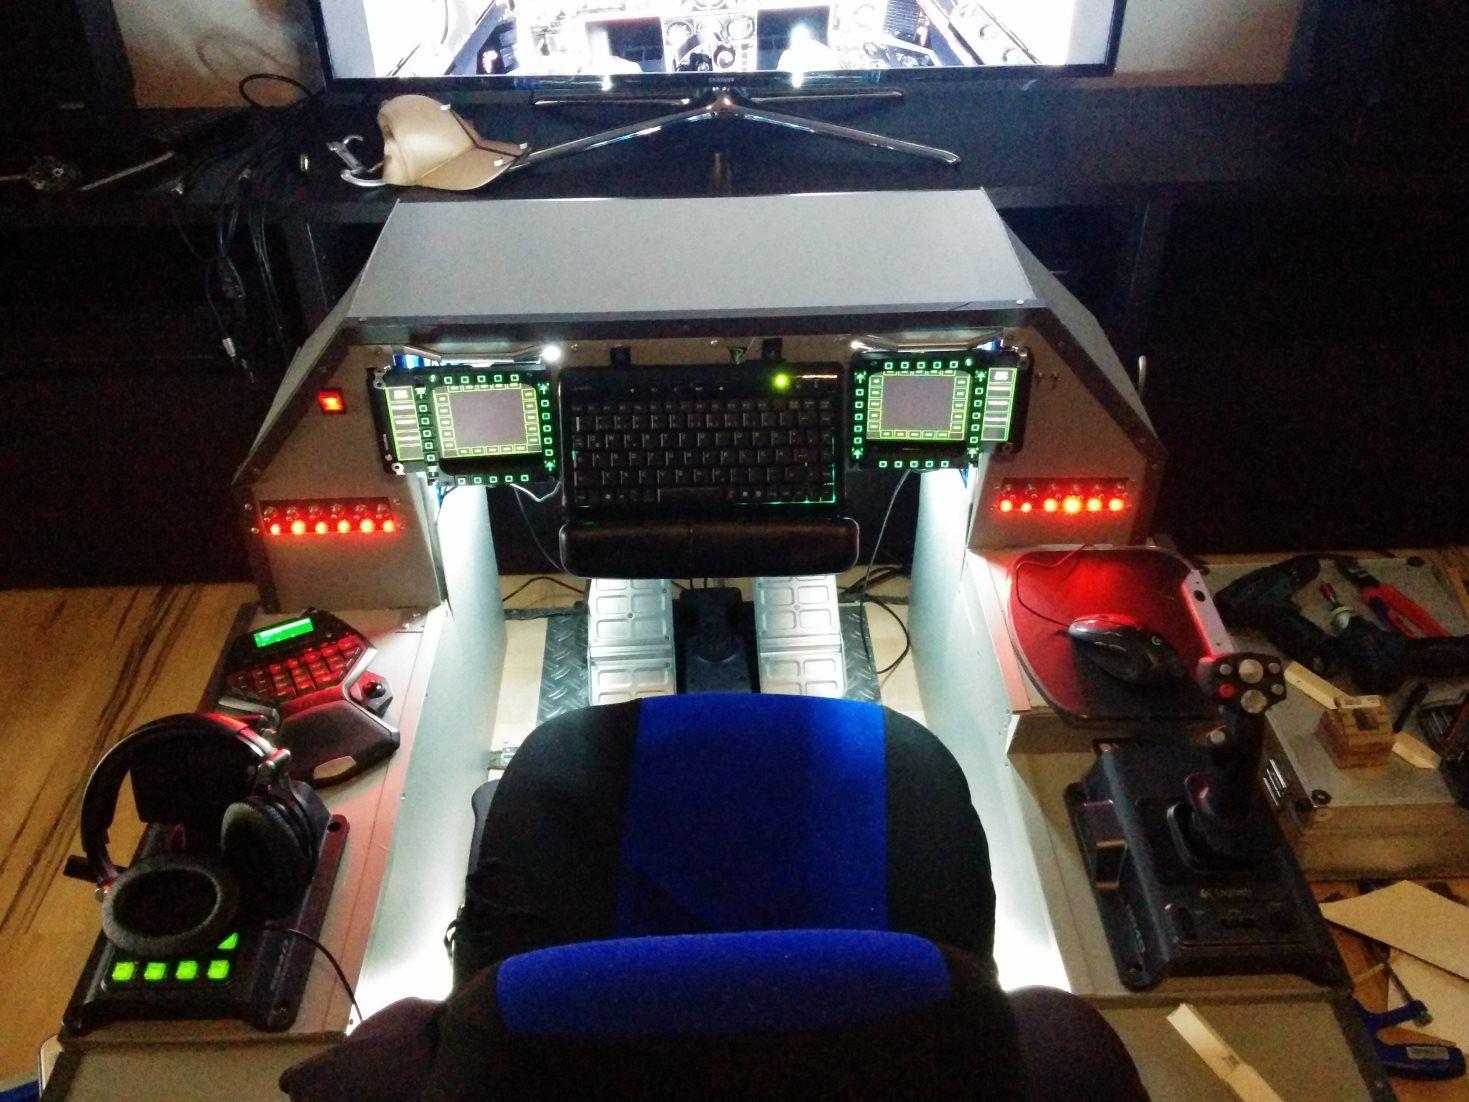 Free Image Hosting Flight simulator, Vr games, Star citizen